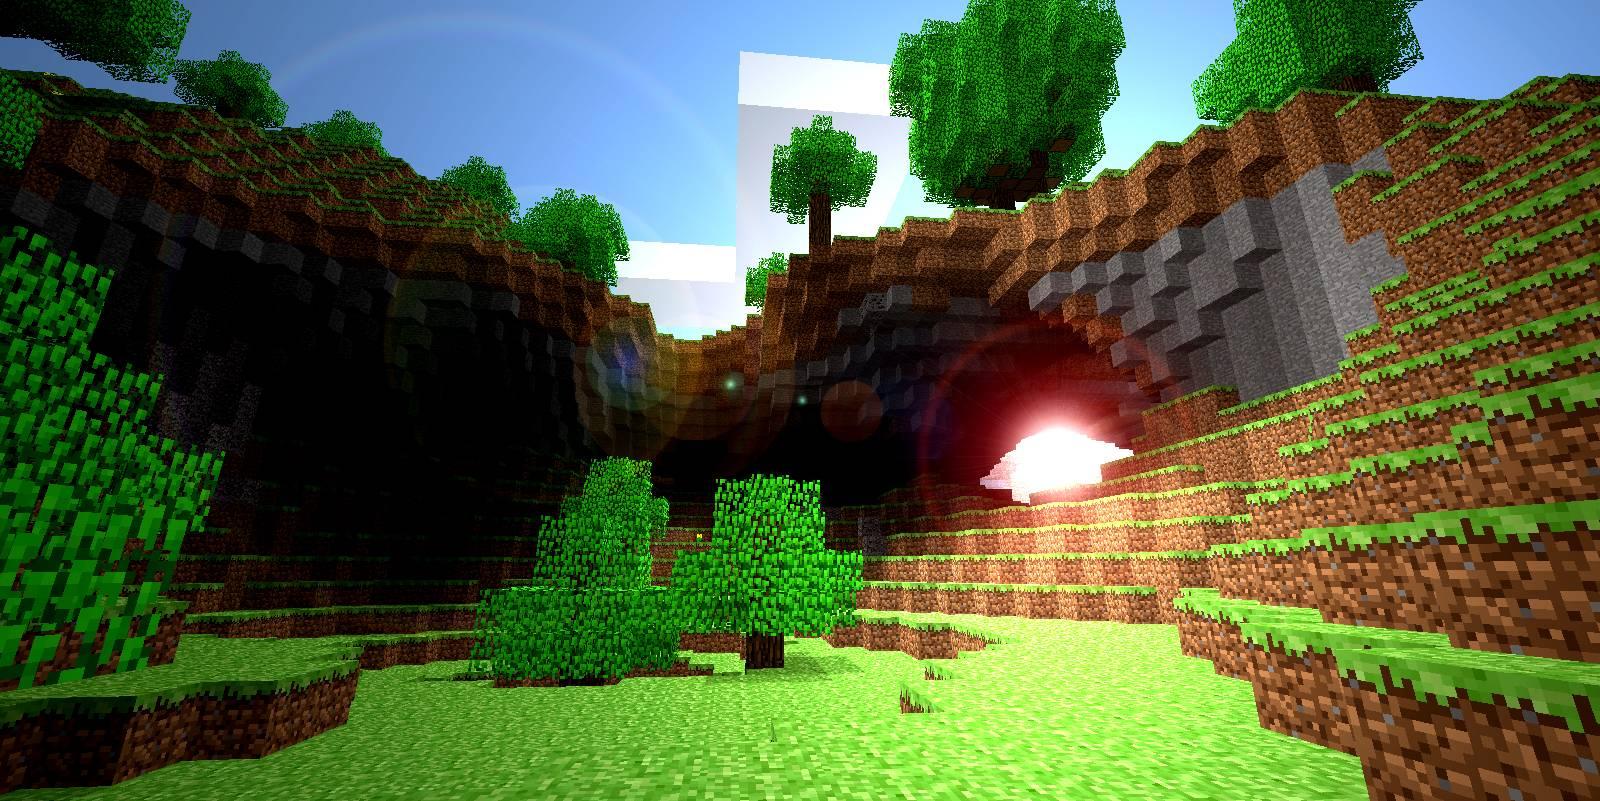 Minecraft HD Wallpapers For Mac , Free Widescreen HD wallpaper